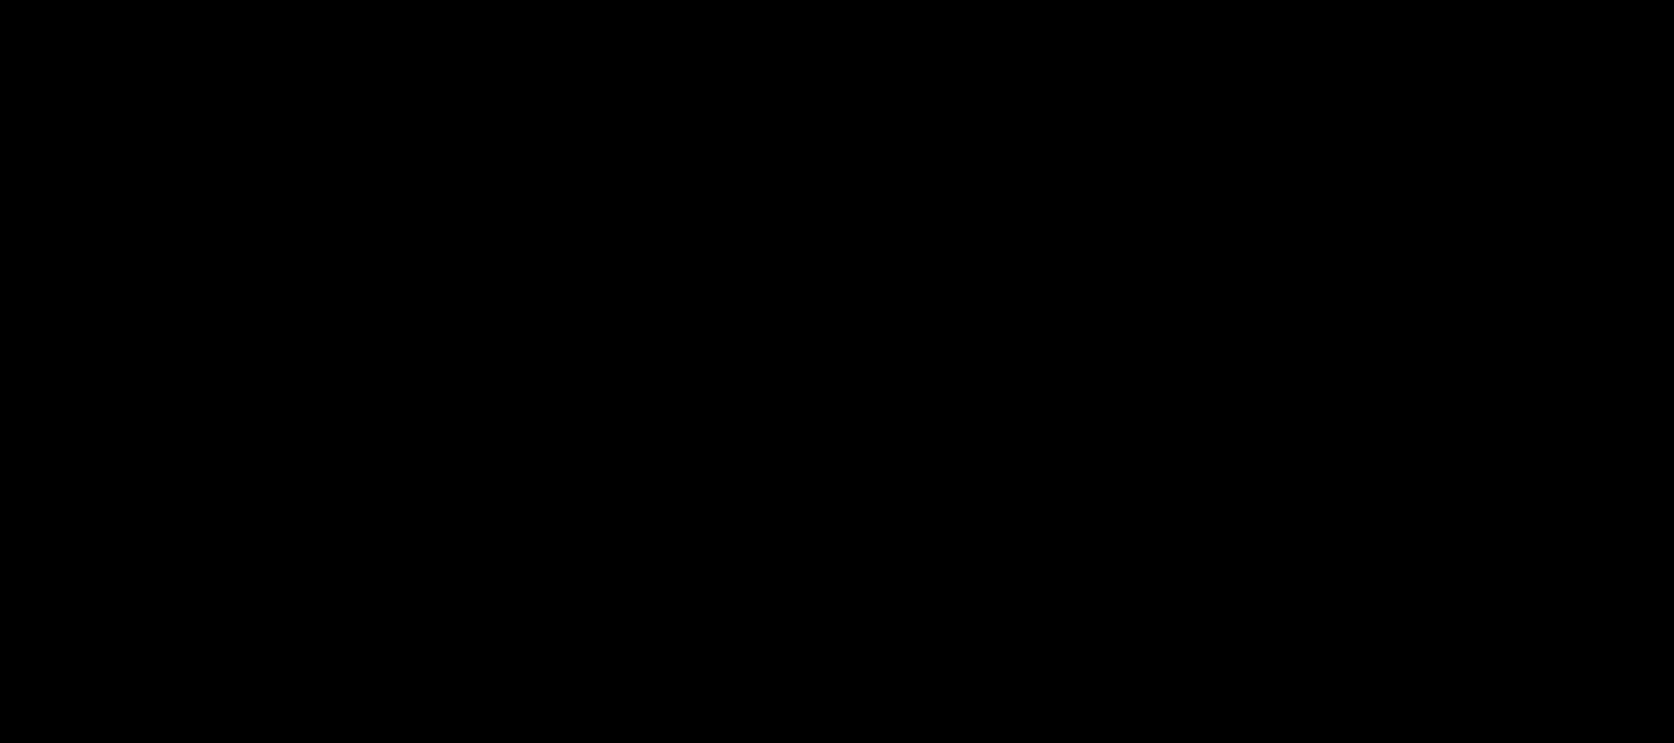 Screen Shot 2017-04-20 at 17.05.16.jpg